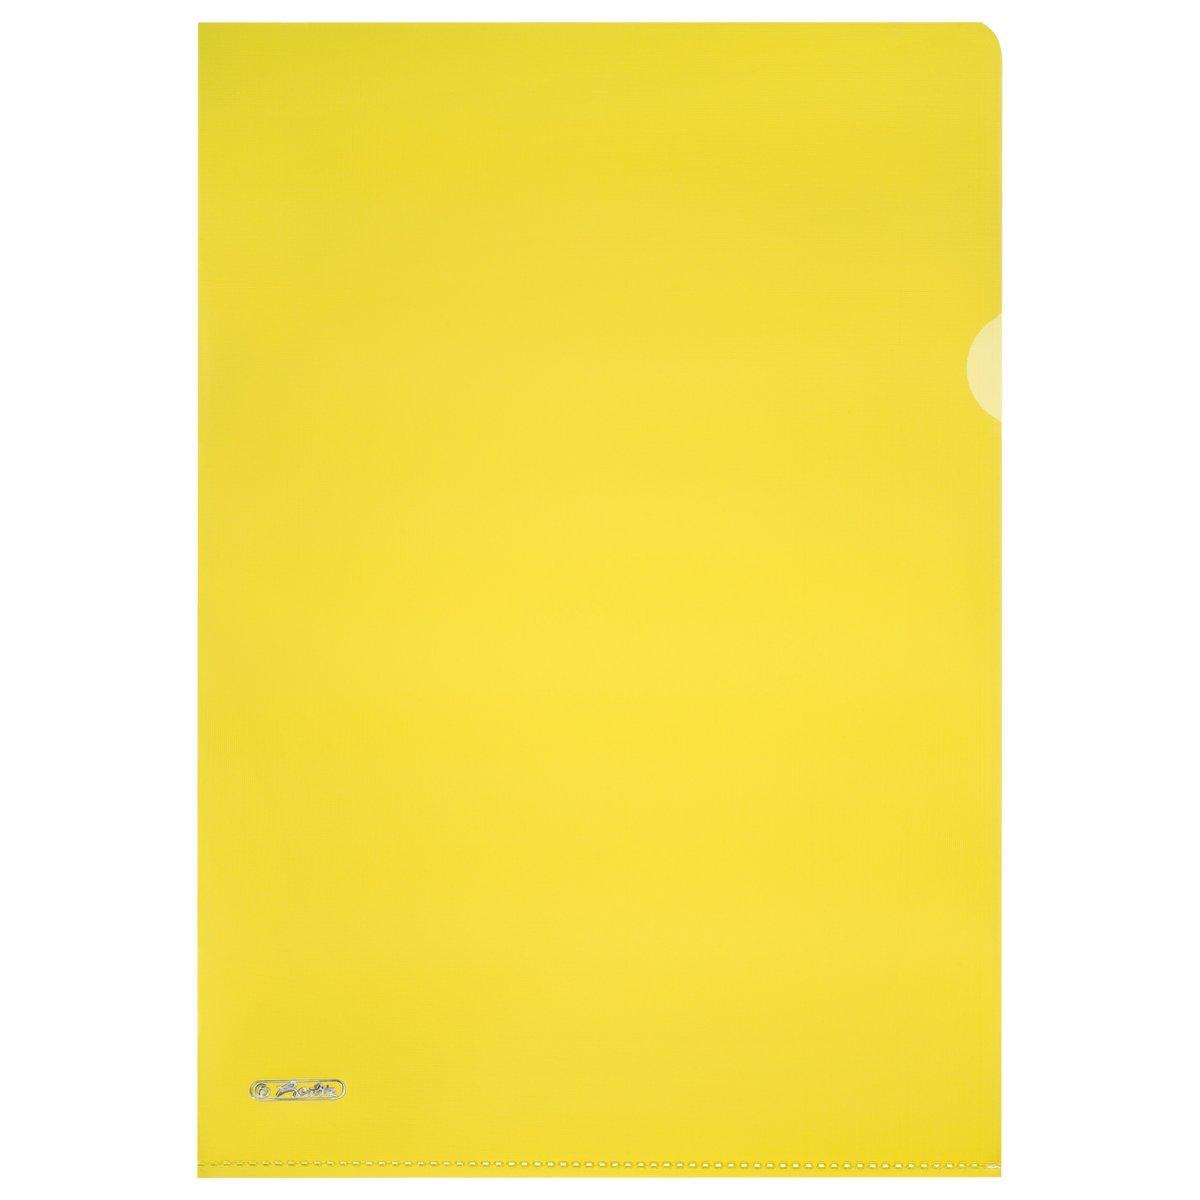 Папки-куточки Herlitz Premium Pyramide А4 10шт 190мкм тиснені жовті